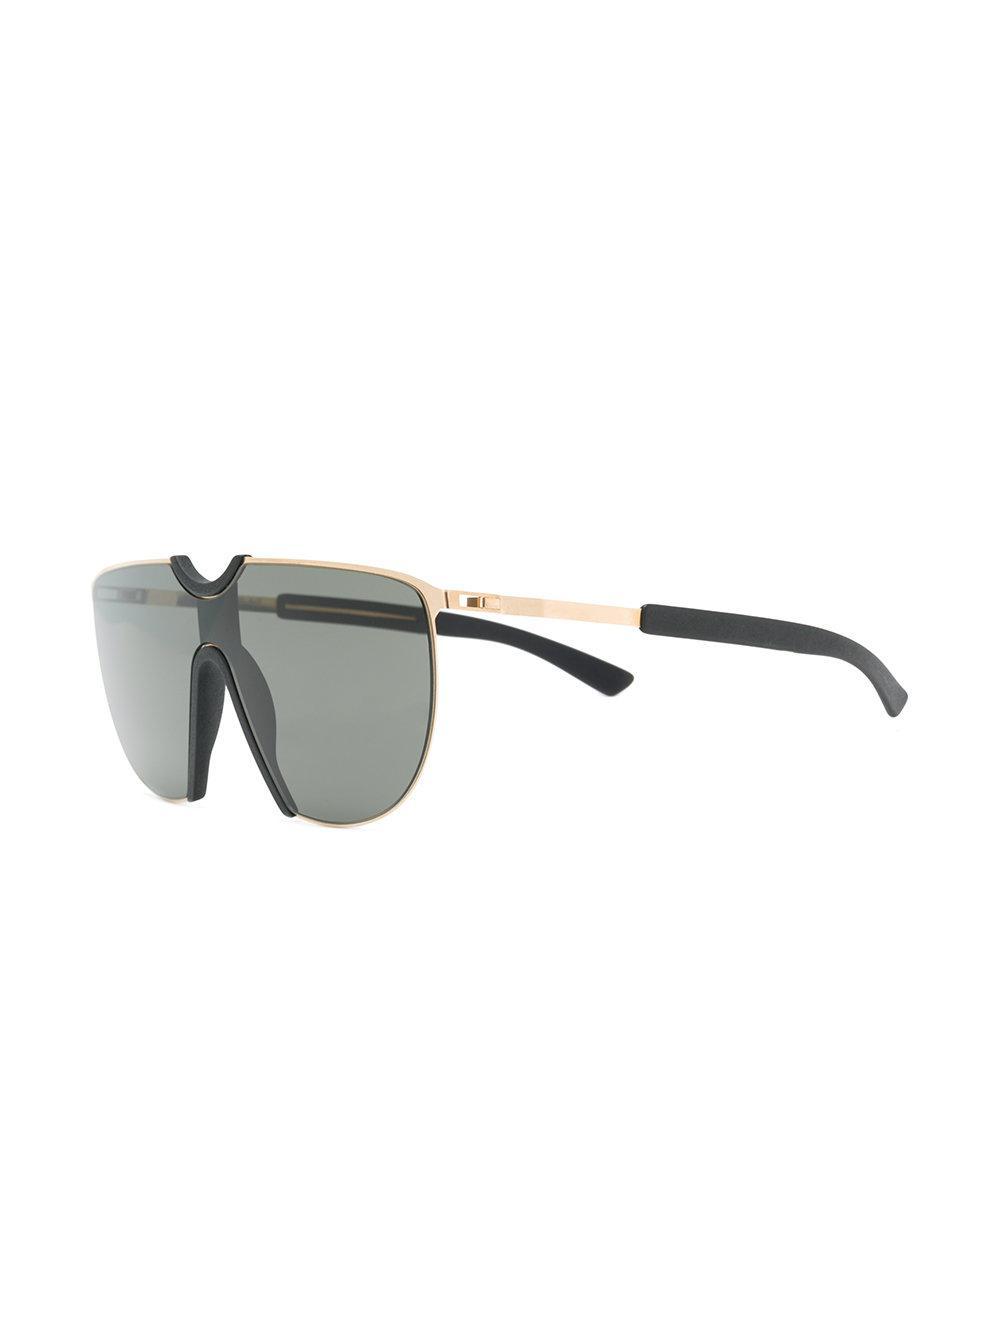 c58ea8c309860 Mykita Oversized Sunglasses in Black - Lyst